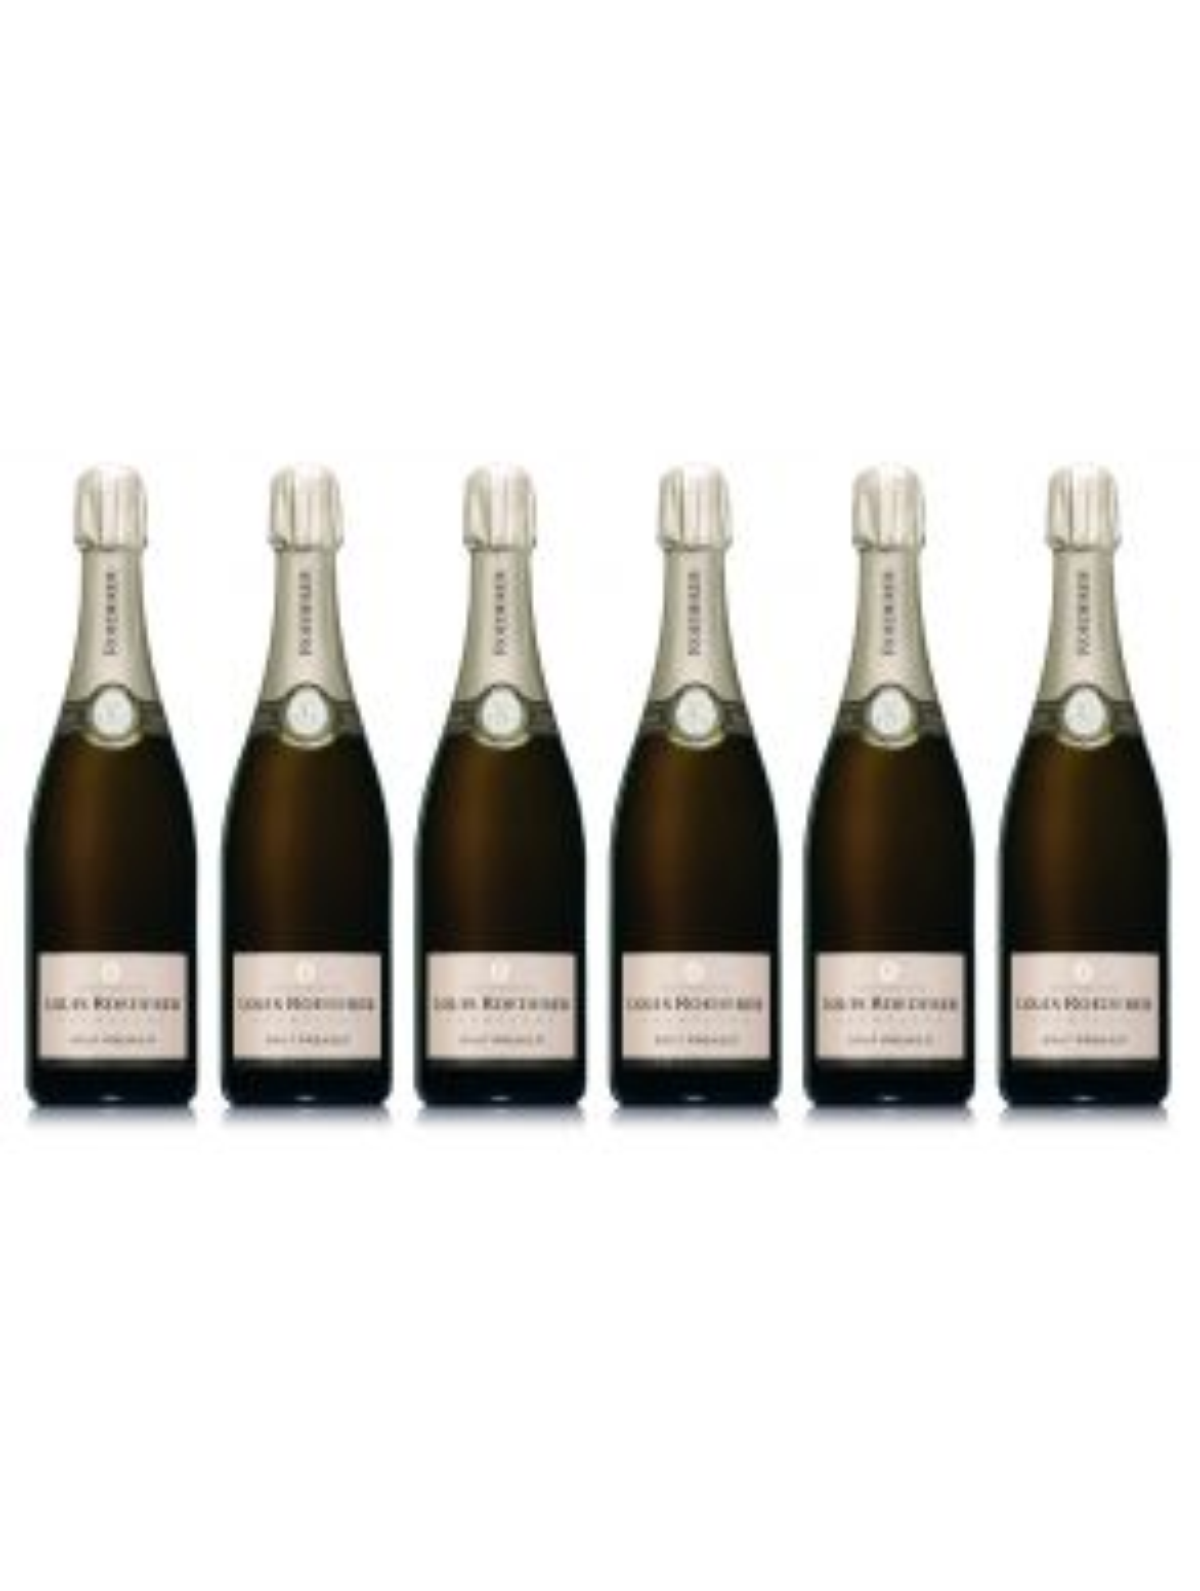 Louis Roederer Brut Premier Champagne Case Deal 6 x 75cl